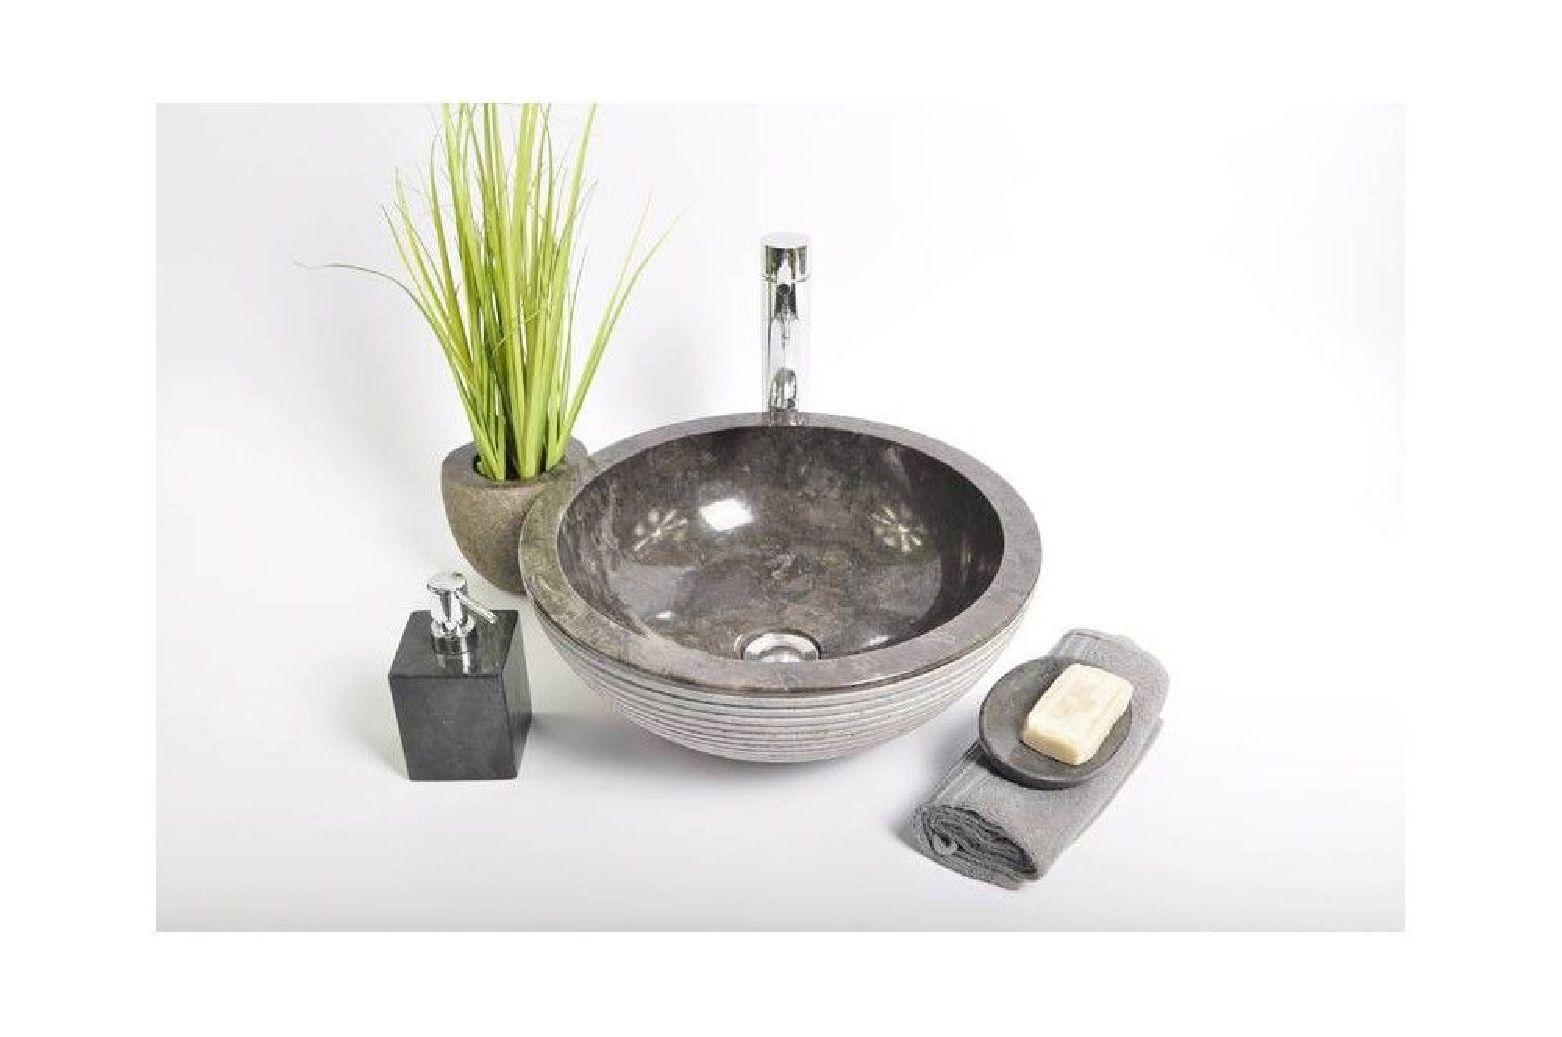 Kc-a black d 40 cm wash basin overtop